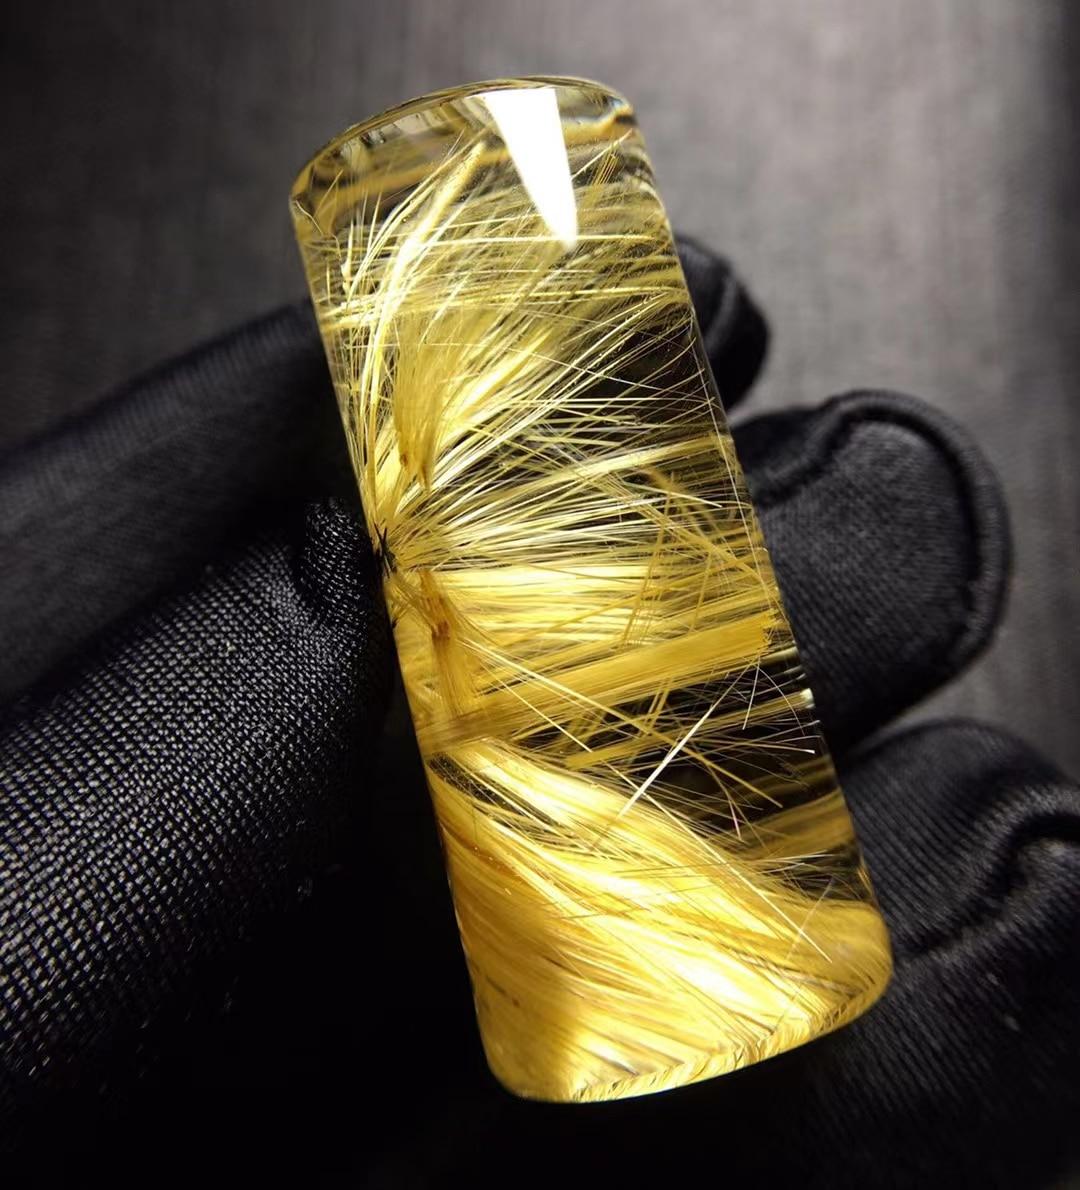 Natural Gold Rutilated Quartz Pendant Brazil 36.3*15.9mm Wealthy Barrel Women Men Women Jewelry 18K Gold AAAAAA